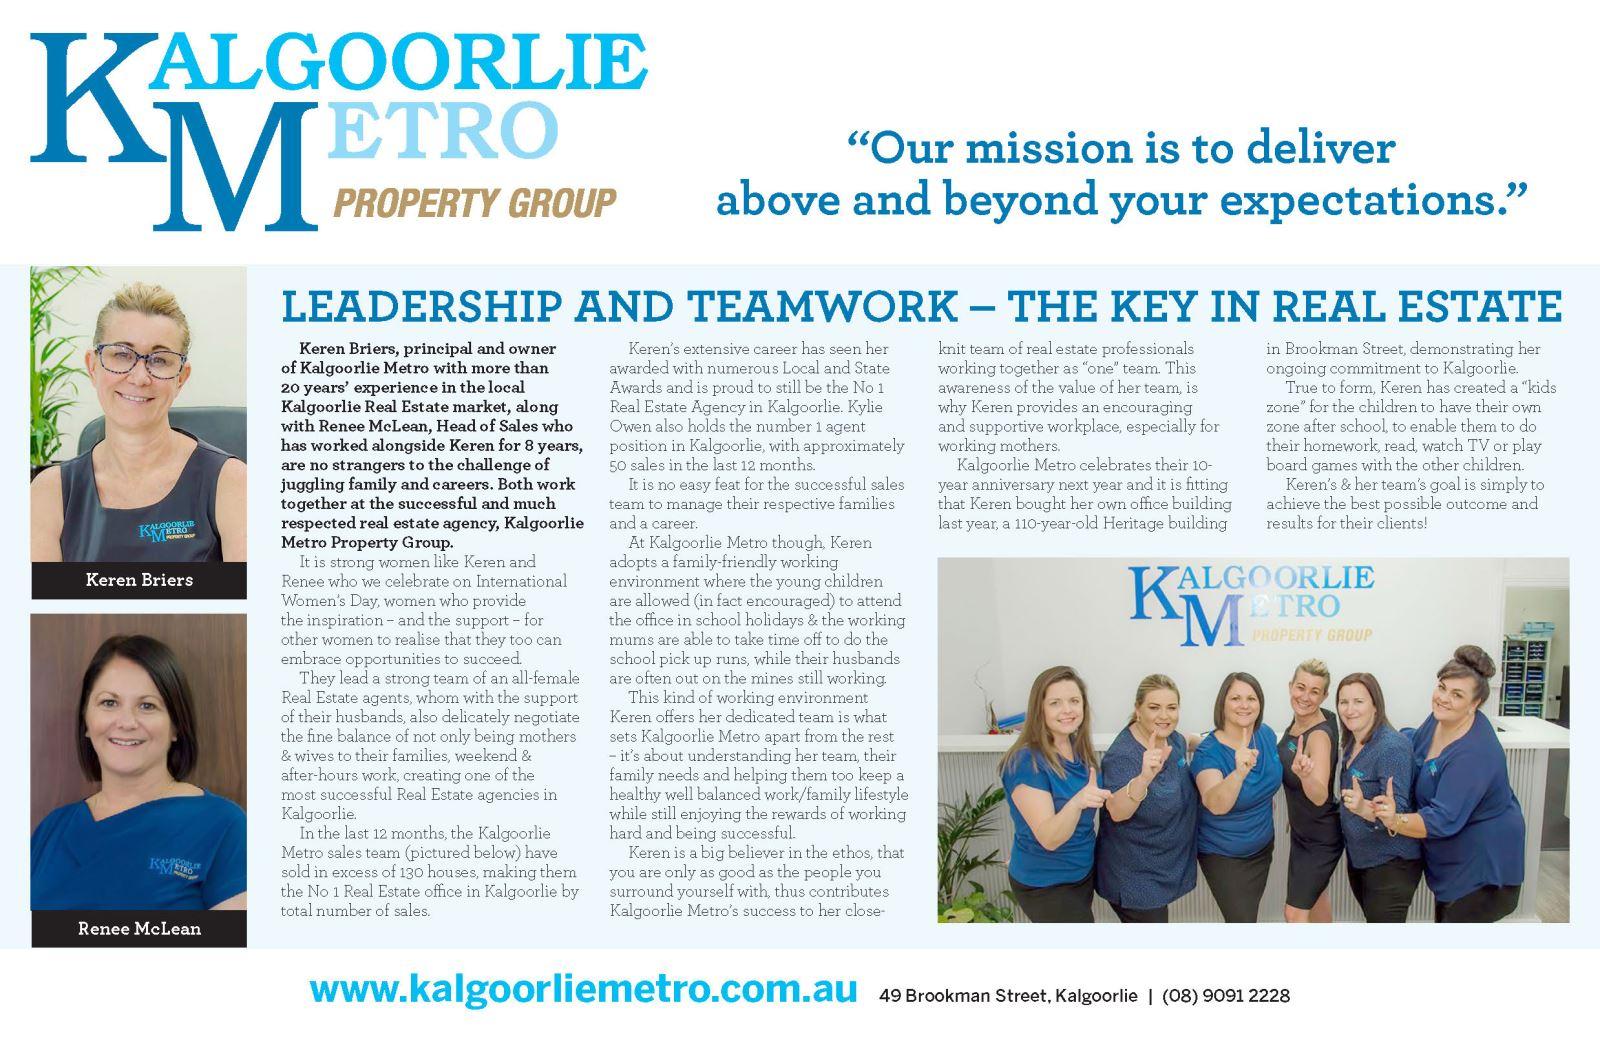 International Women's Day 2018 - Kalgoorlie Miner Article